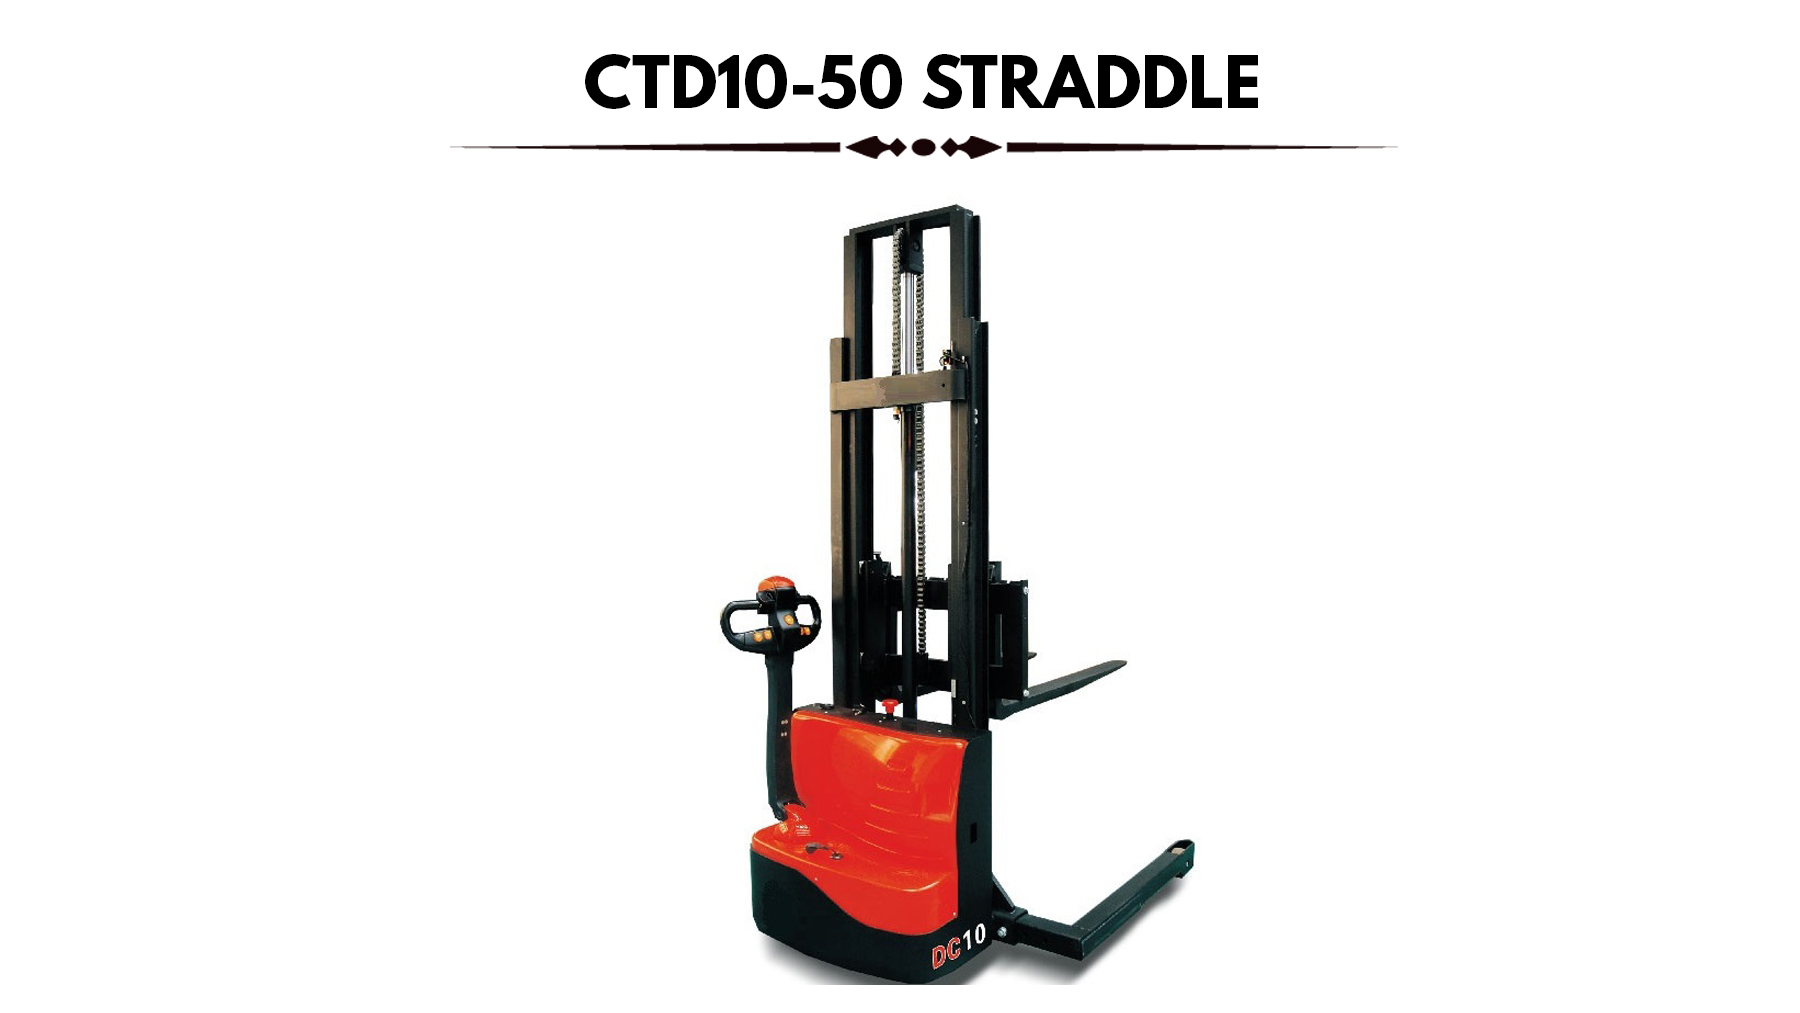 Straddle Stacker